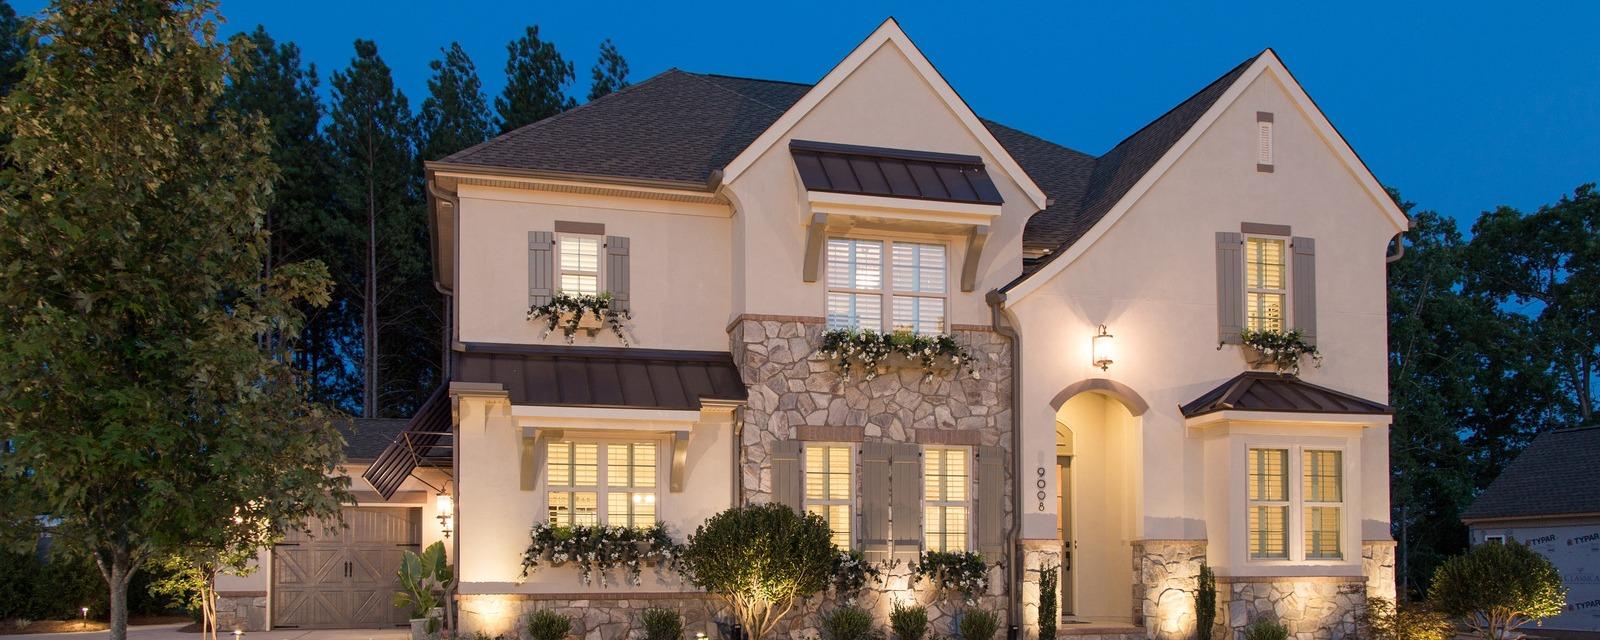 Classica Homes | Custom Home Builder in Charlotte NC